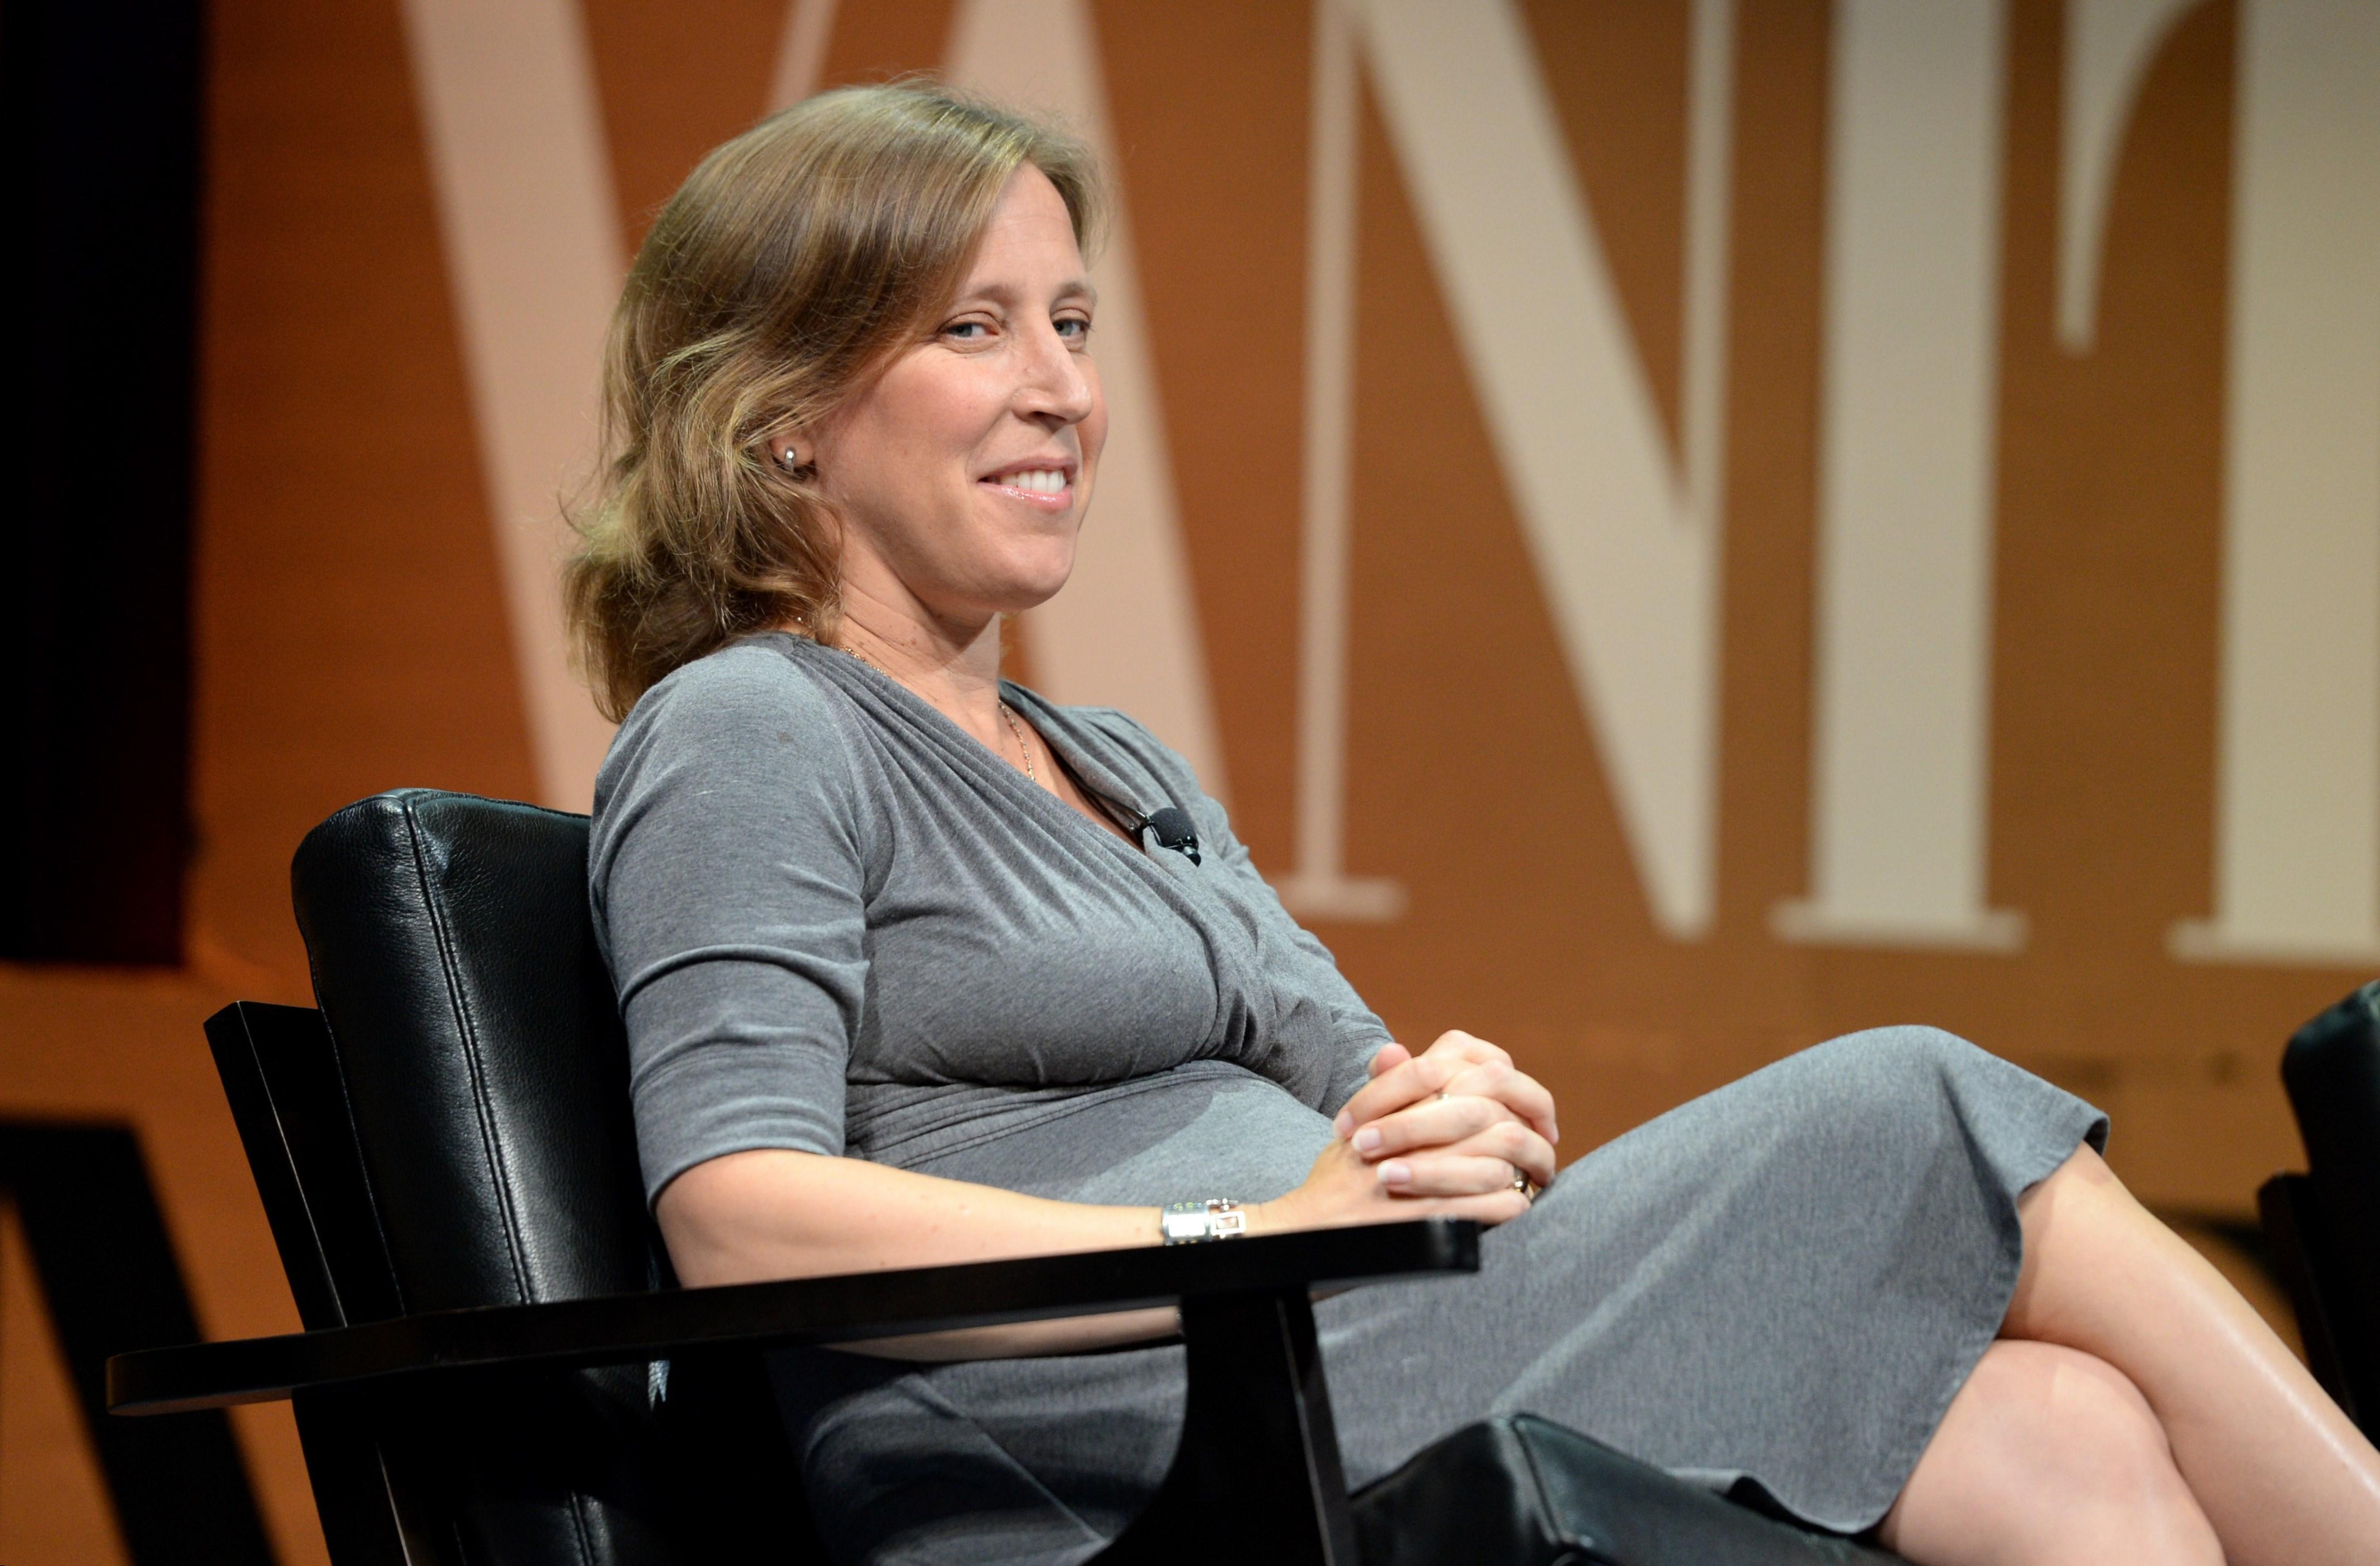 Susan Wojcicki Height